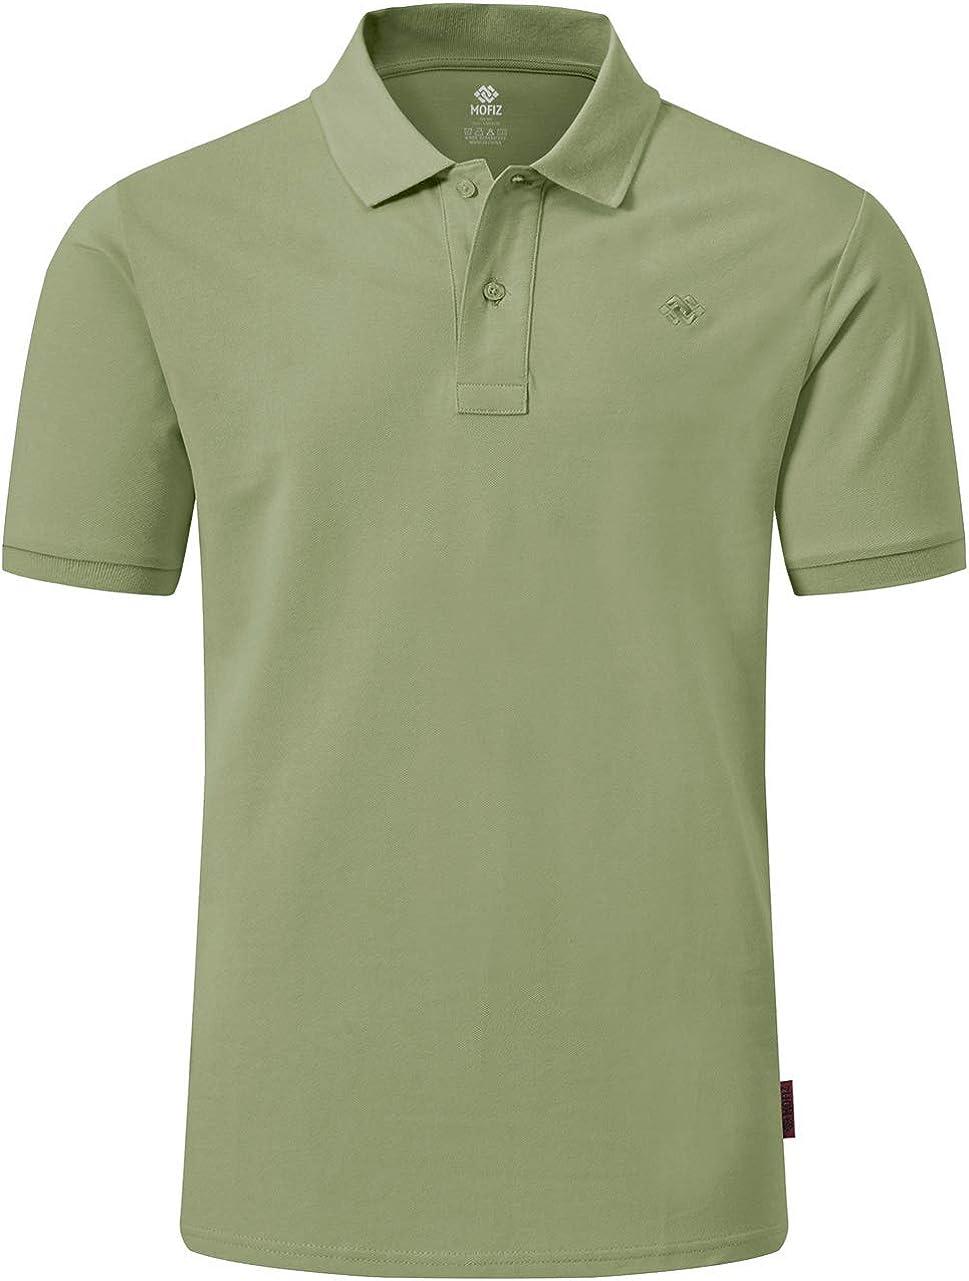 MoFiz Men's famous Golf Shirts Short NEW before selling Sleeve 100% Athletic Cotton